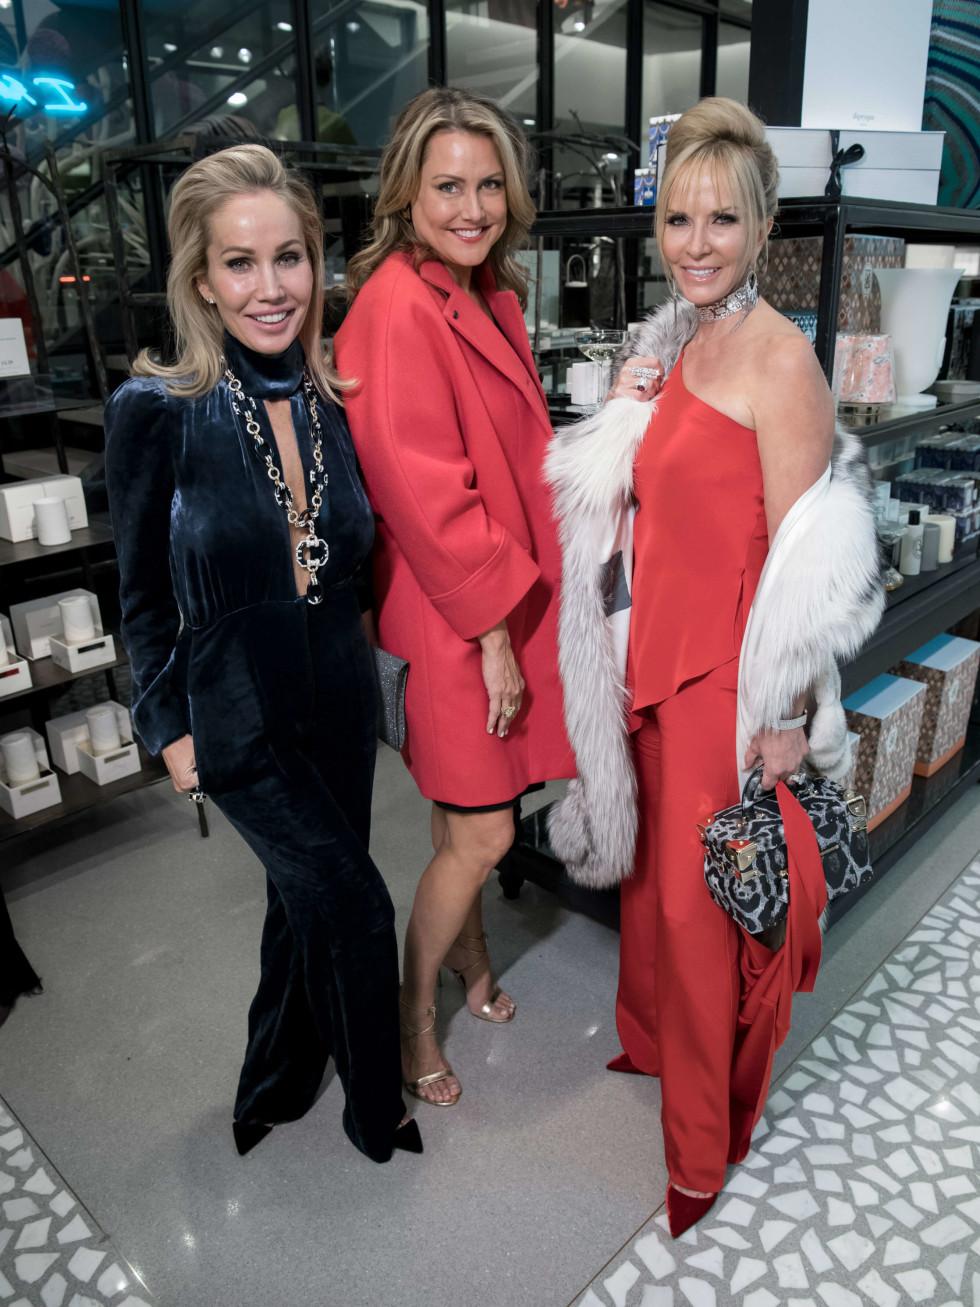 Brooke Davenport, Caroline Summers, Nancy Rogers